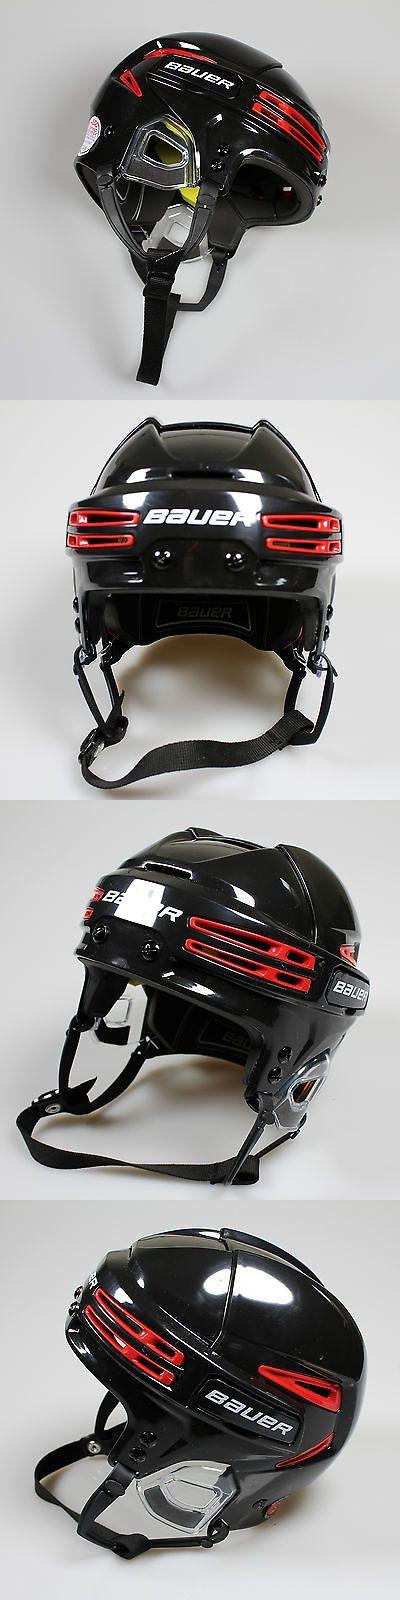 Helmets 20854: New Bauer Re-Akt 75 Senior Ice Hockey Helmet Black Red -> BUY IT NOW ONLY: $119.99 on eBay!